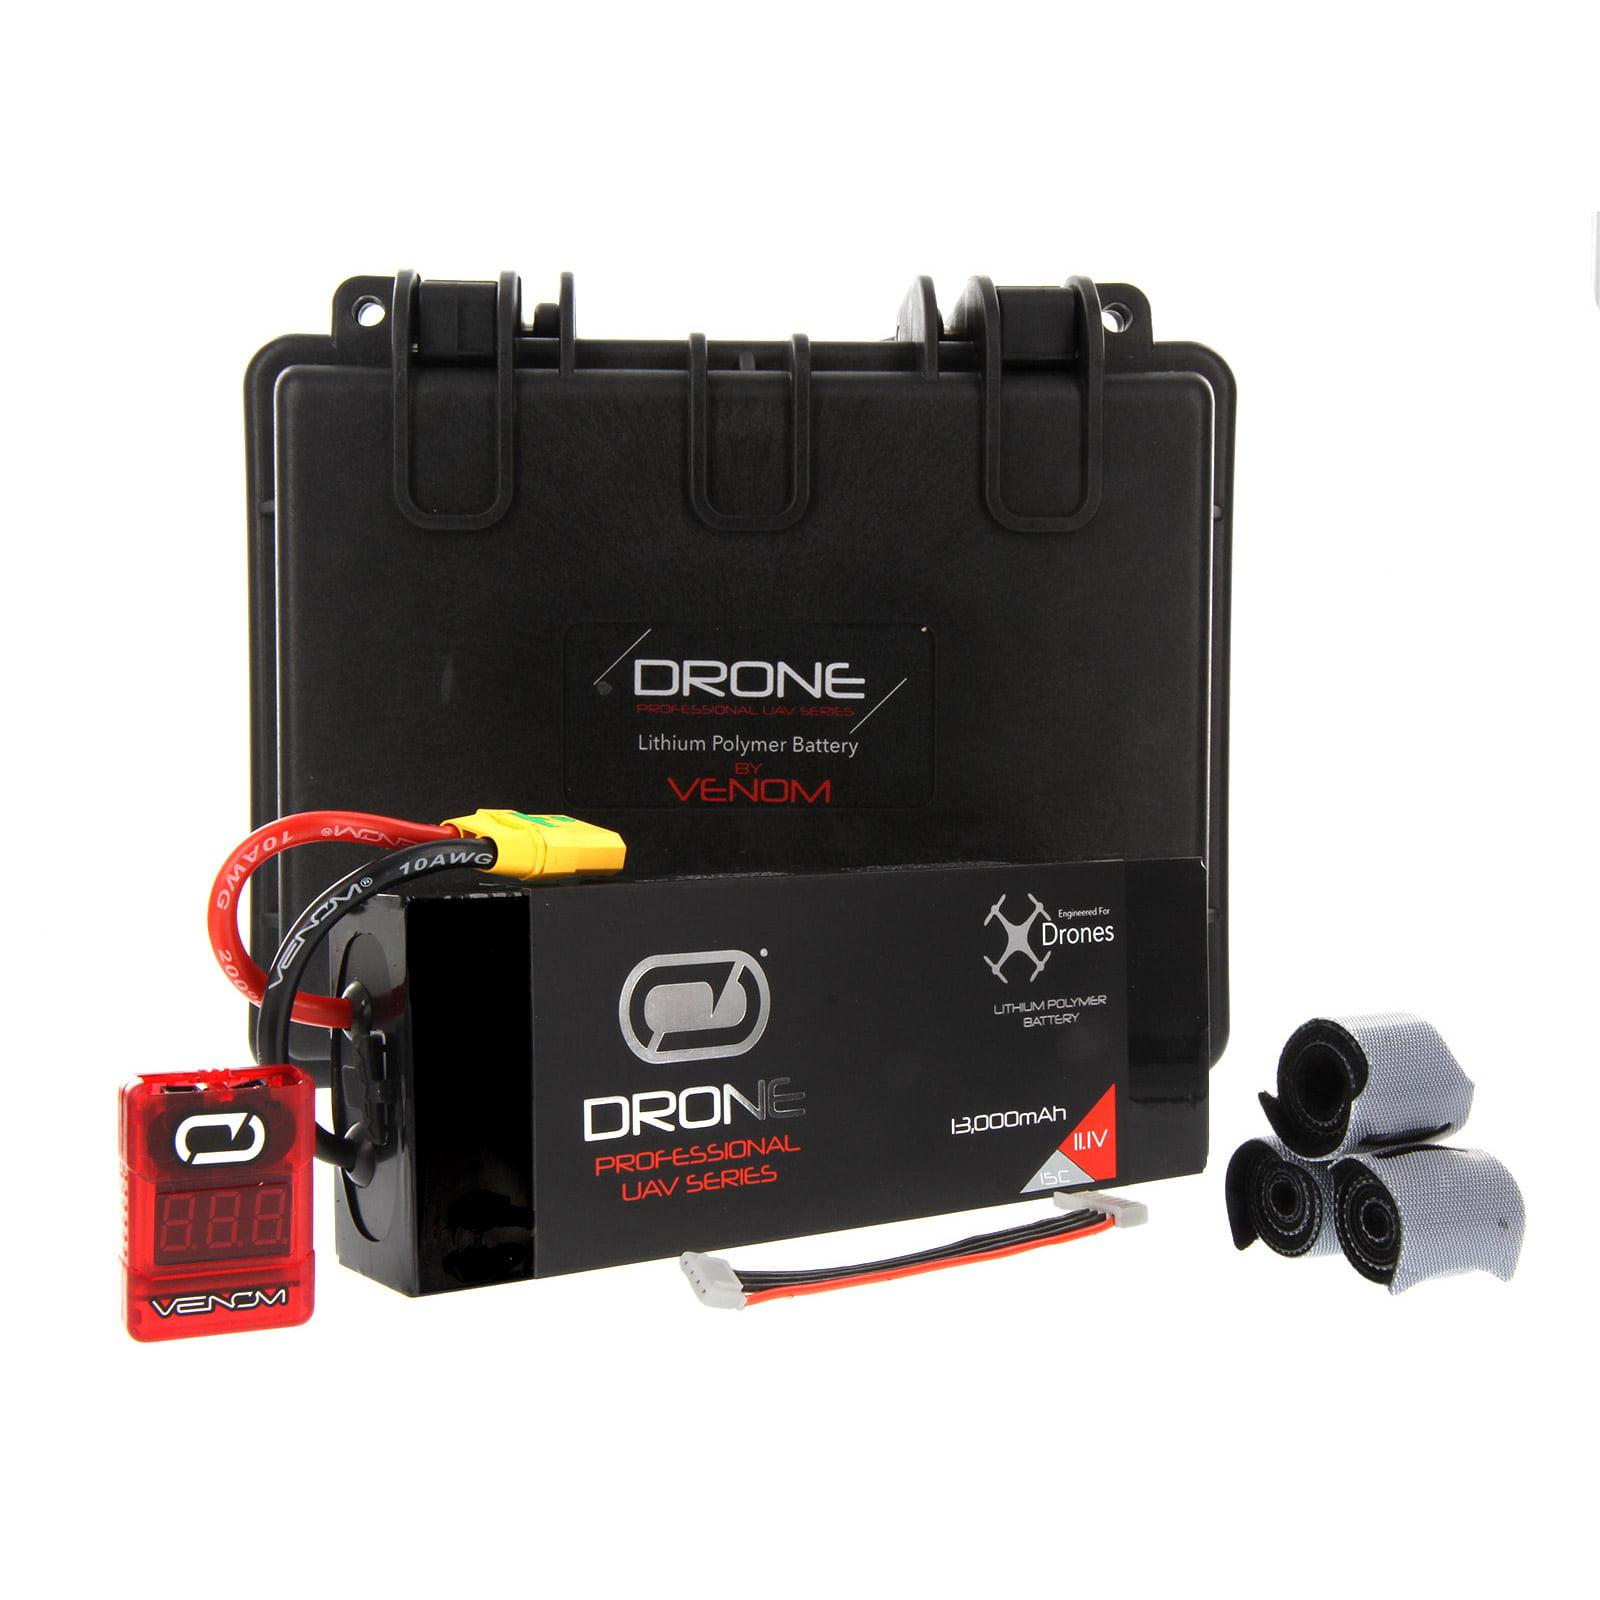 Tarot T810 15C 3S 13000mAh 11.1V LiPo Drone Pro Battery w/ XT90-S plug by Venom